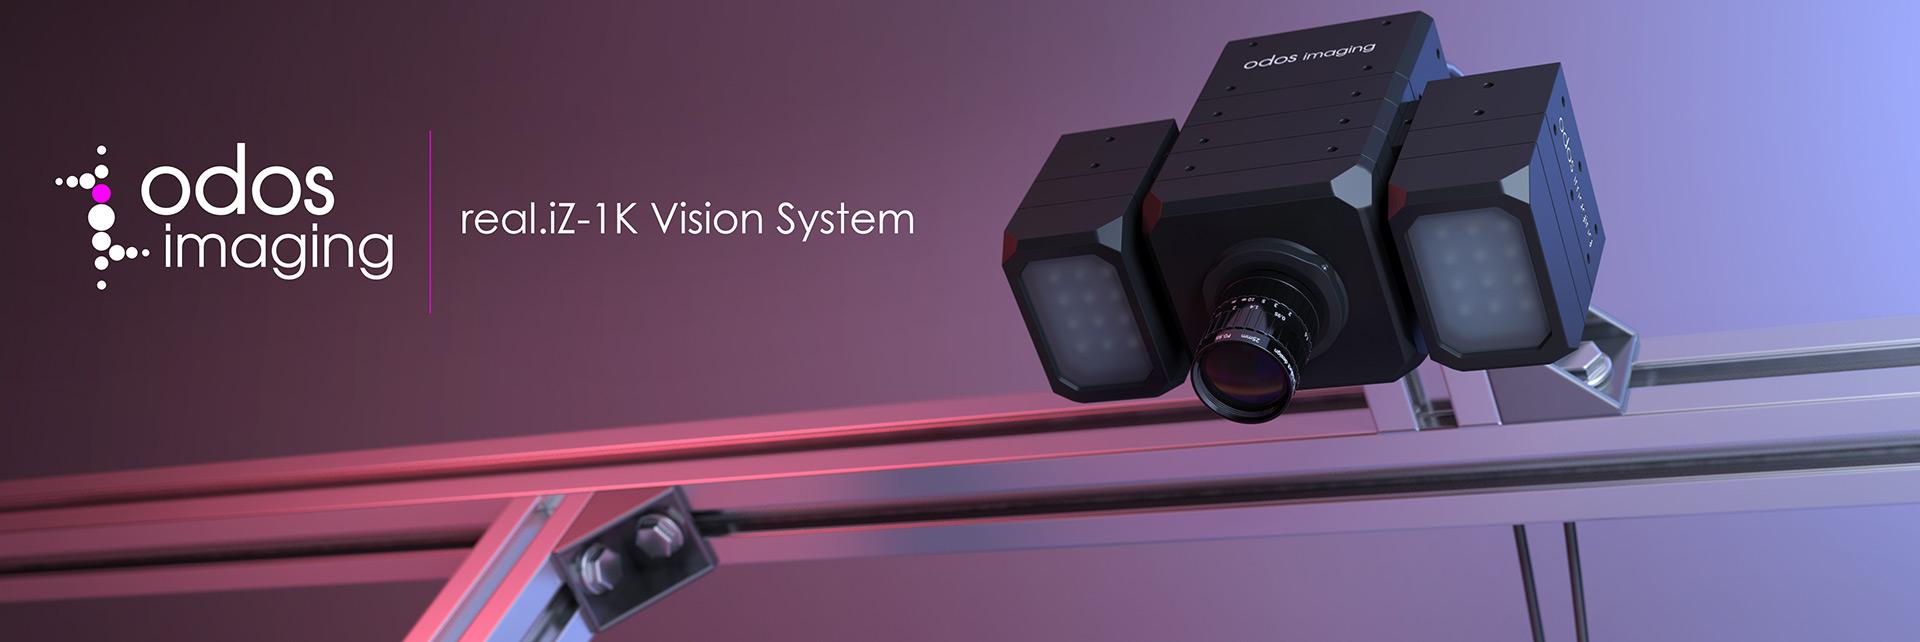 Odos Imaging - StarForm 3D time-of-flight camera